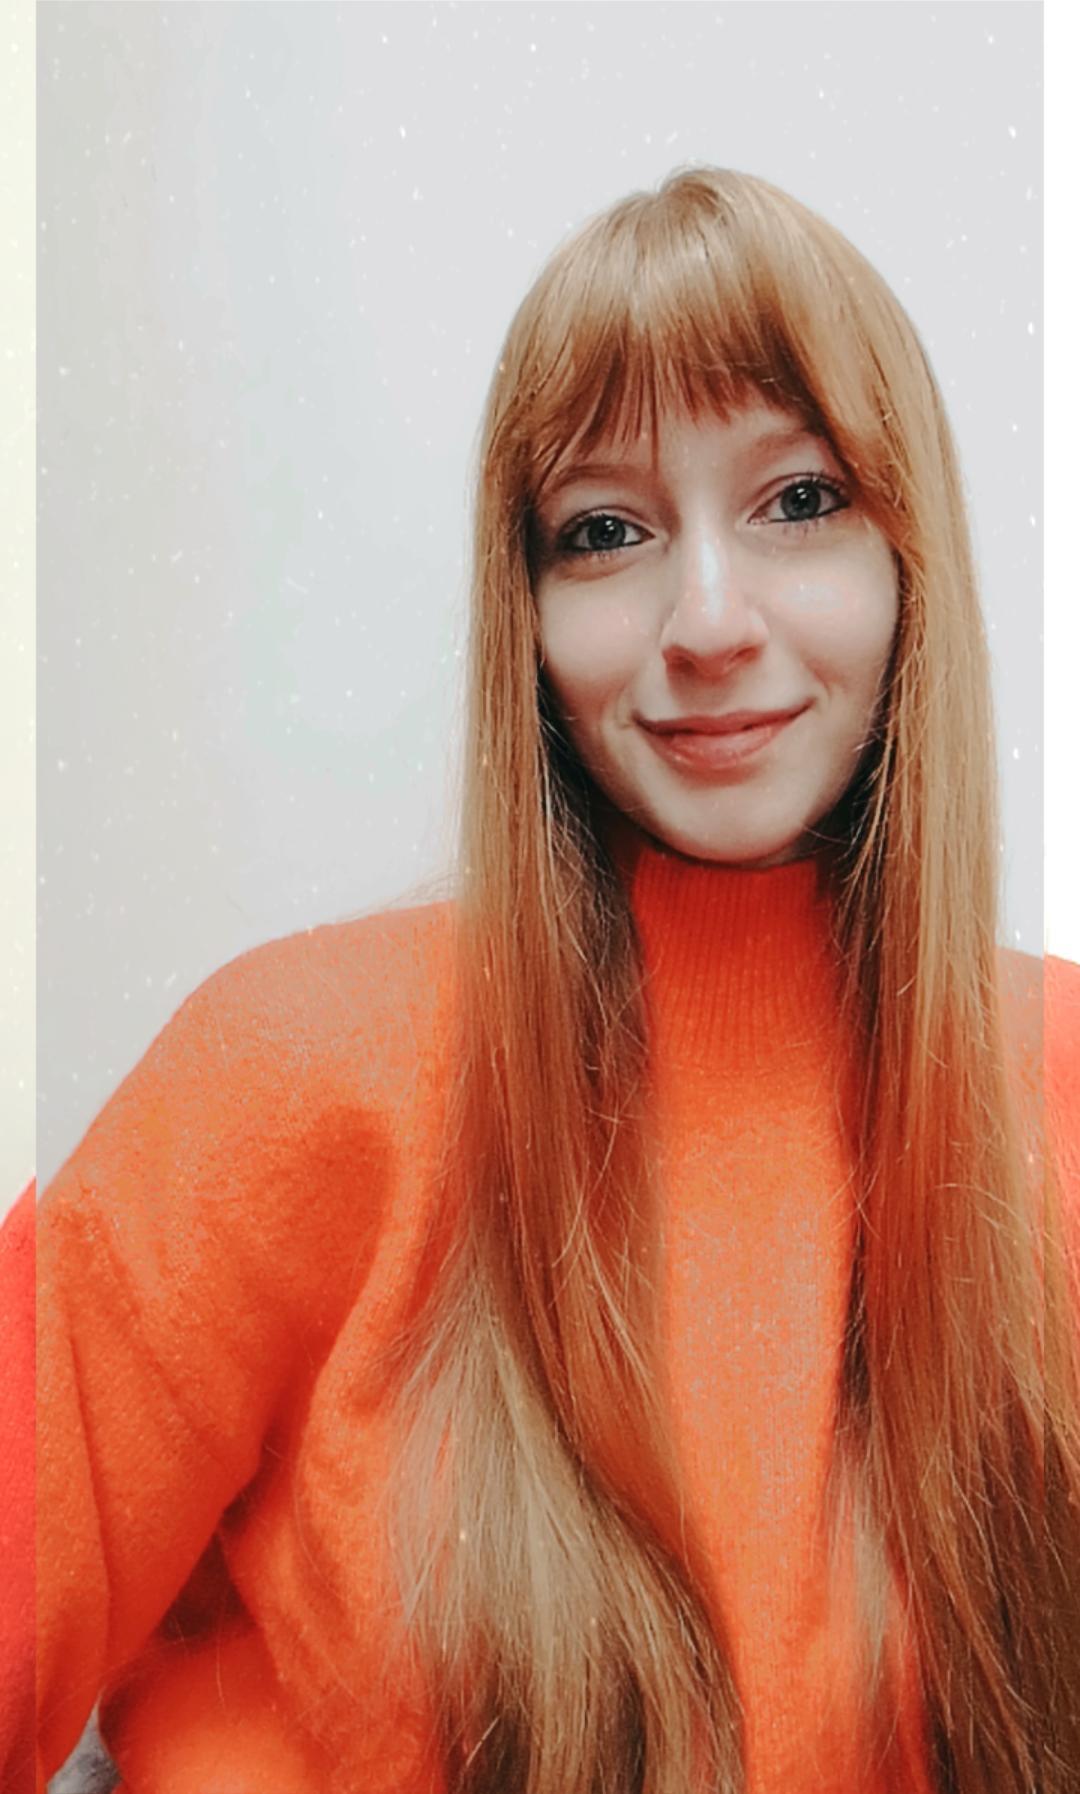 Cristina Ricci wearing an orange jumper